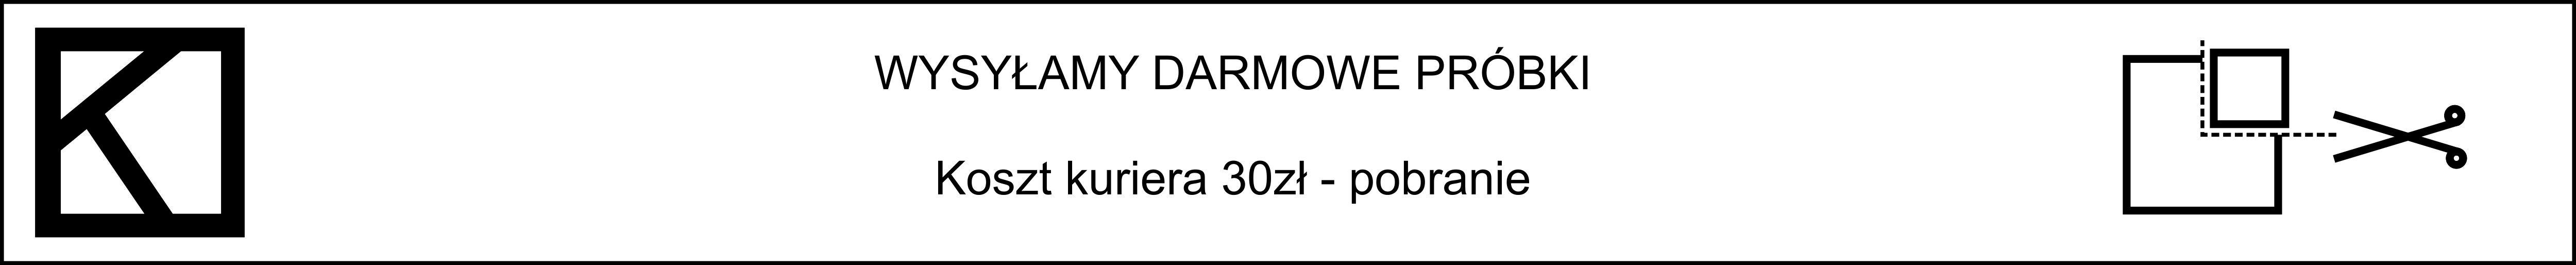 banner darmowa próbka